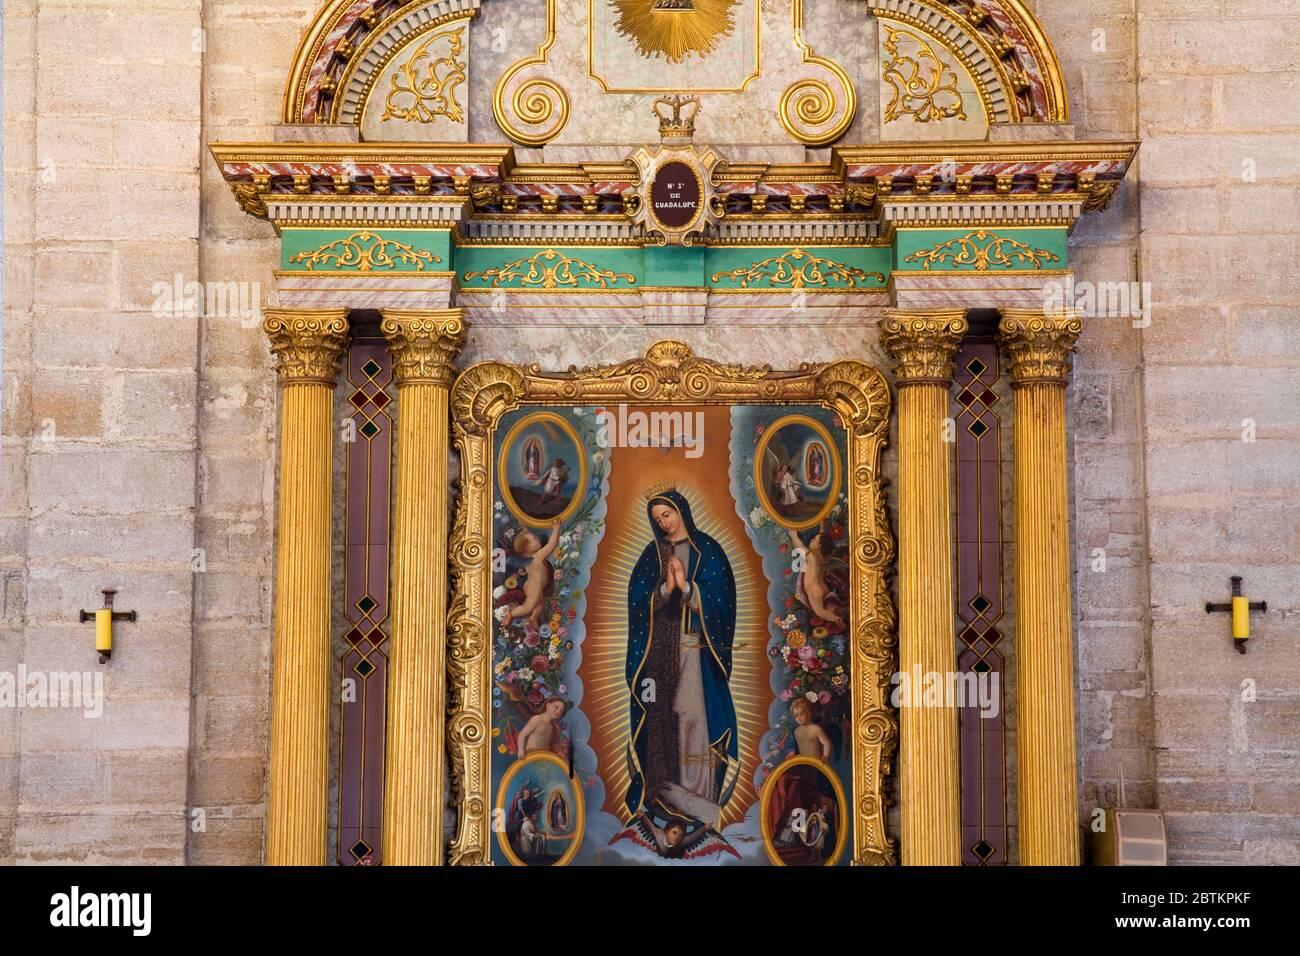 Cathedral on Plaza de Armas, Colonial City of La Serena, Norte Chico Region, Chile, South America Stock Photo